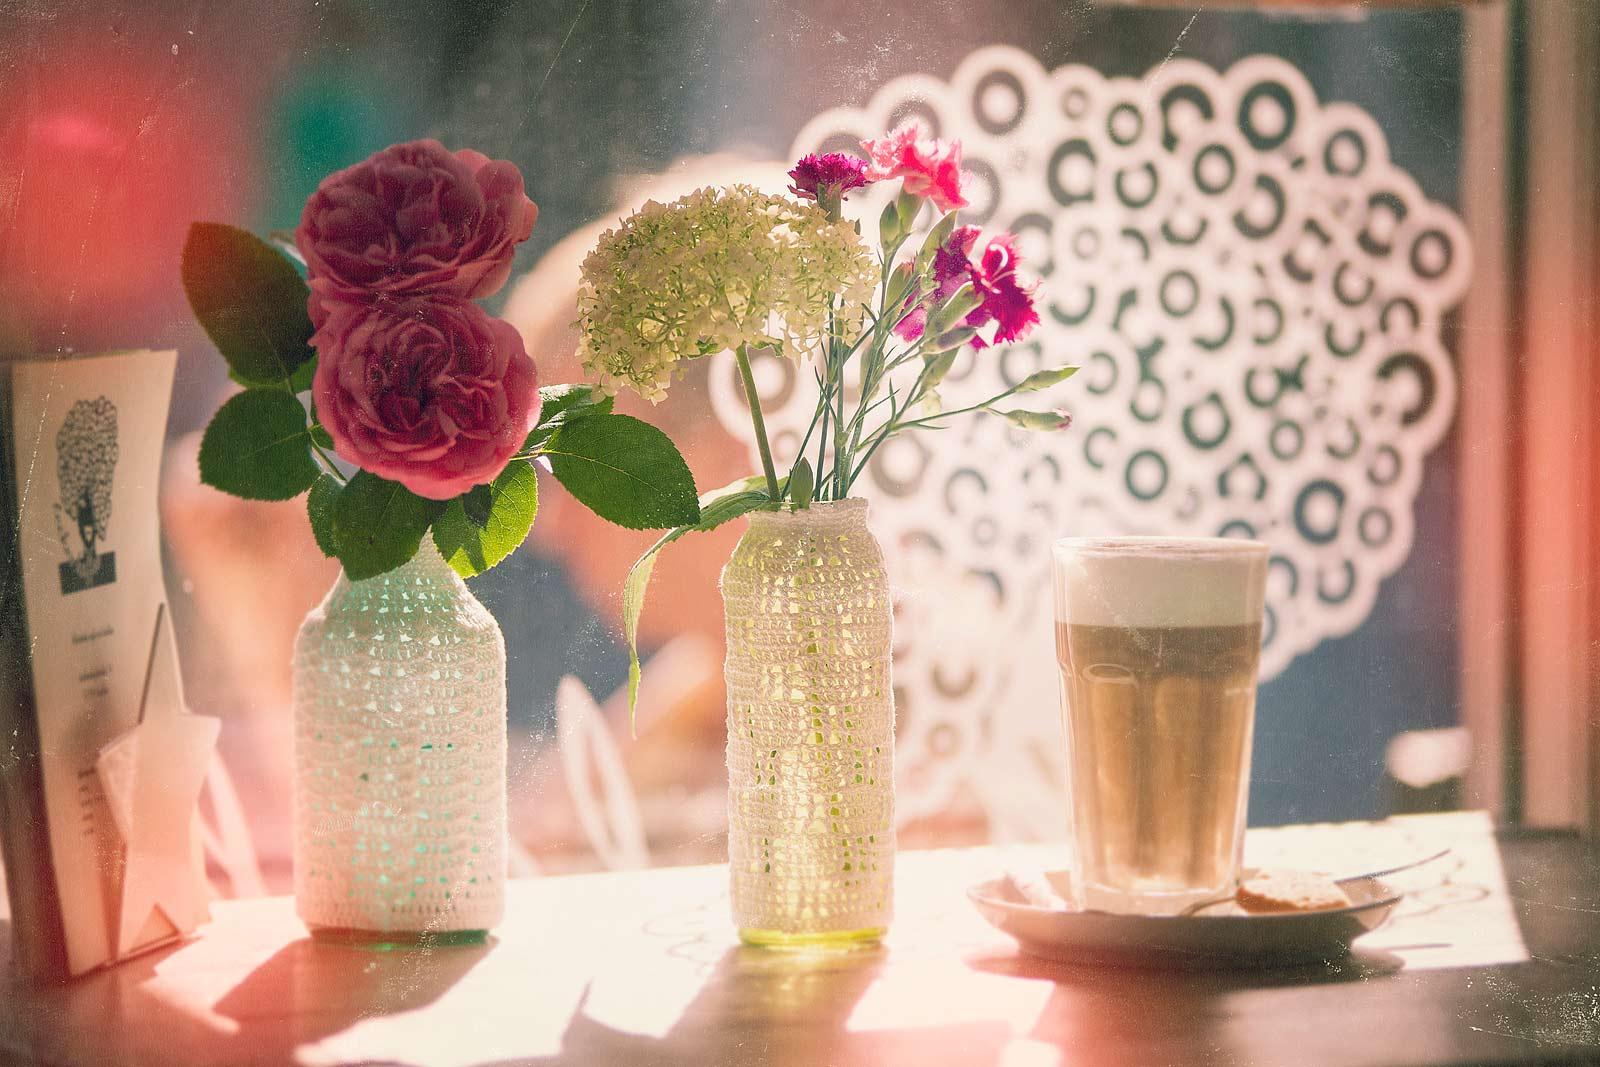 start-up-fotografie-cafe-blumen.JPG